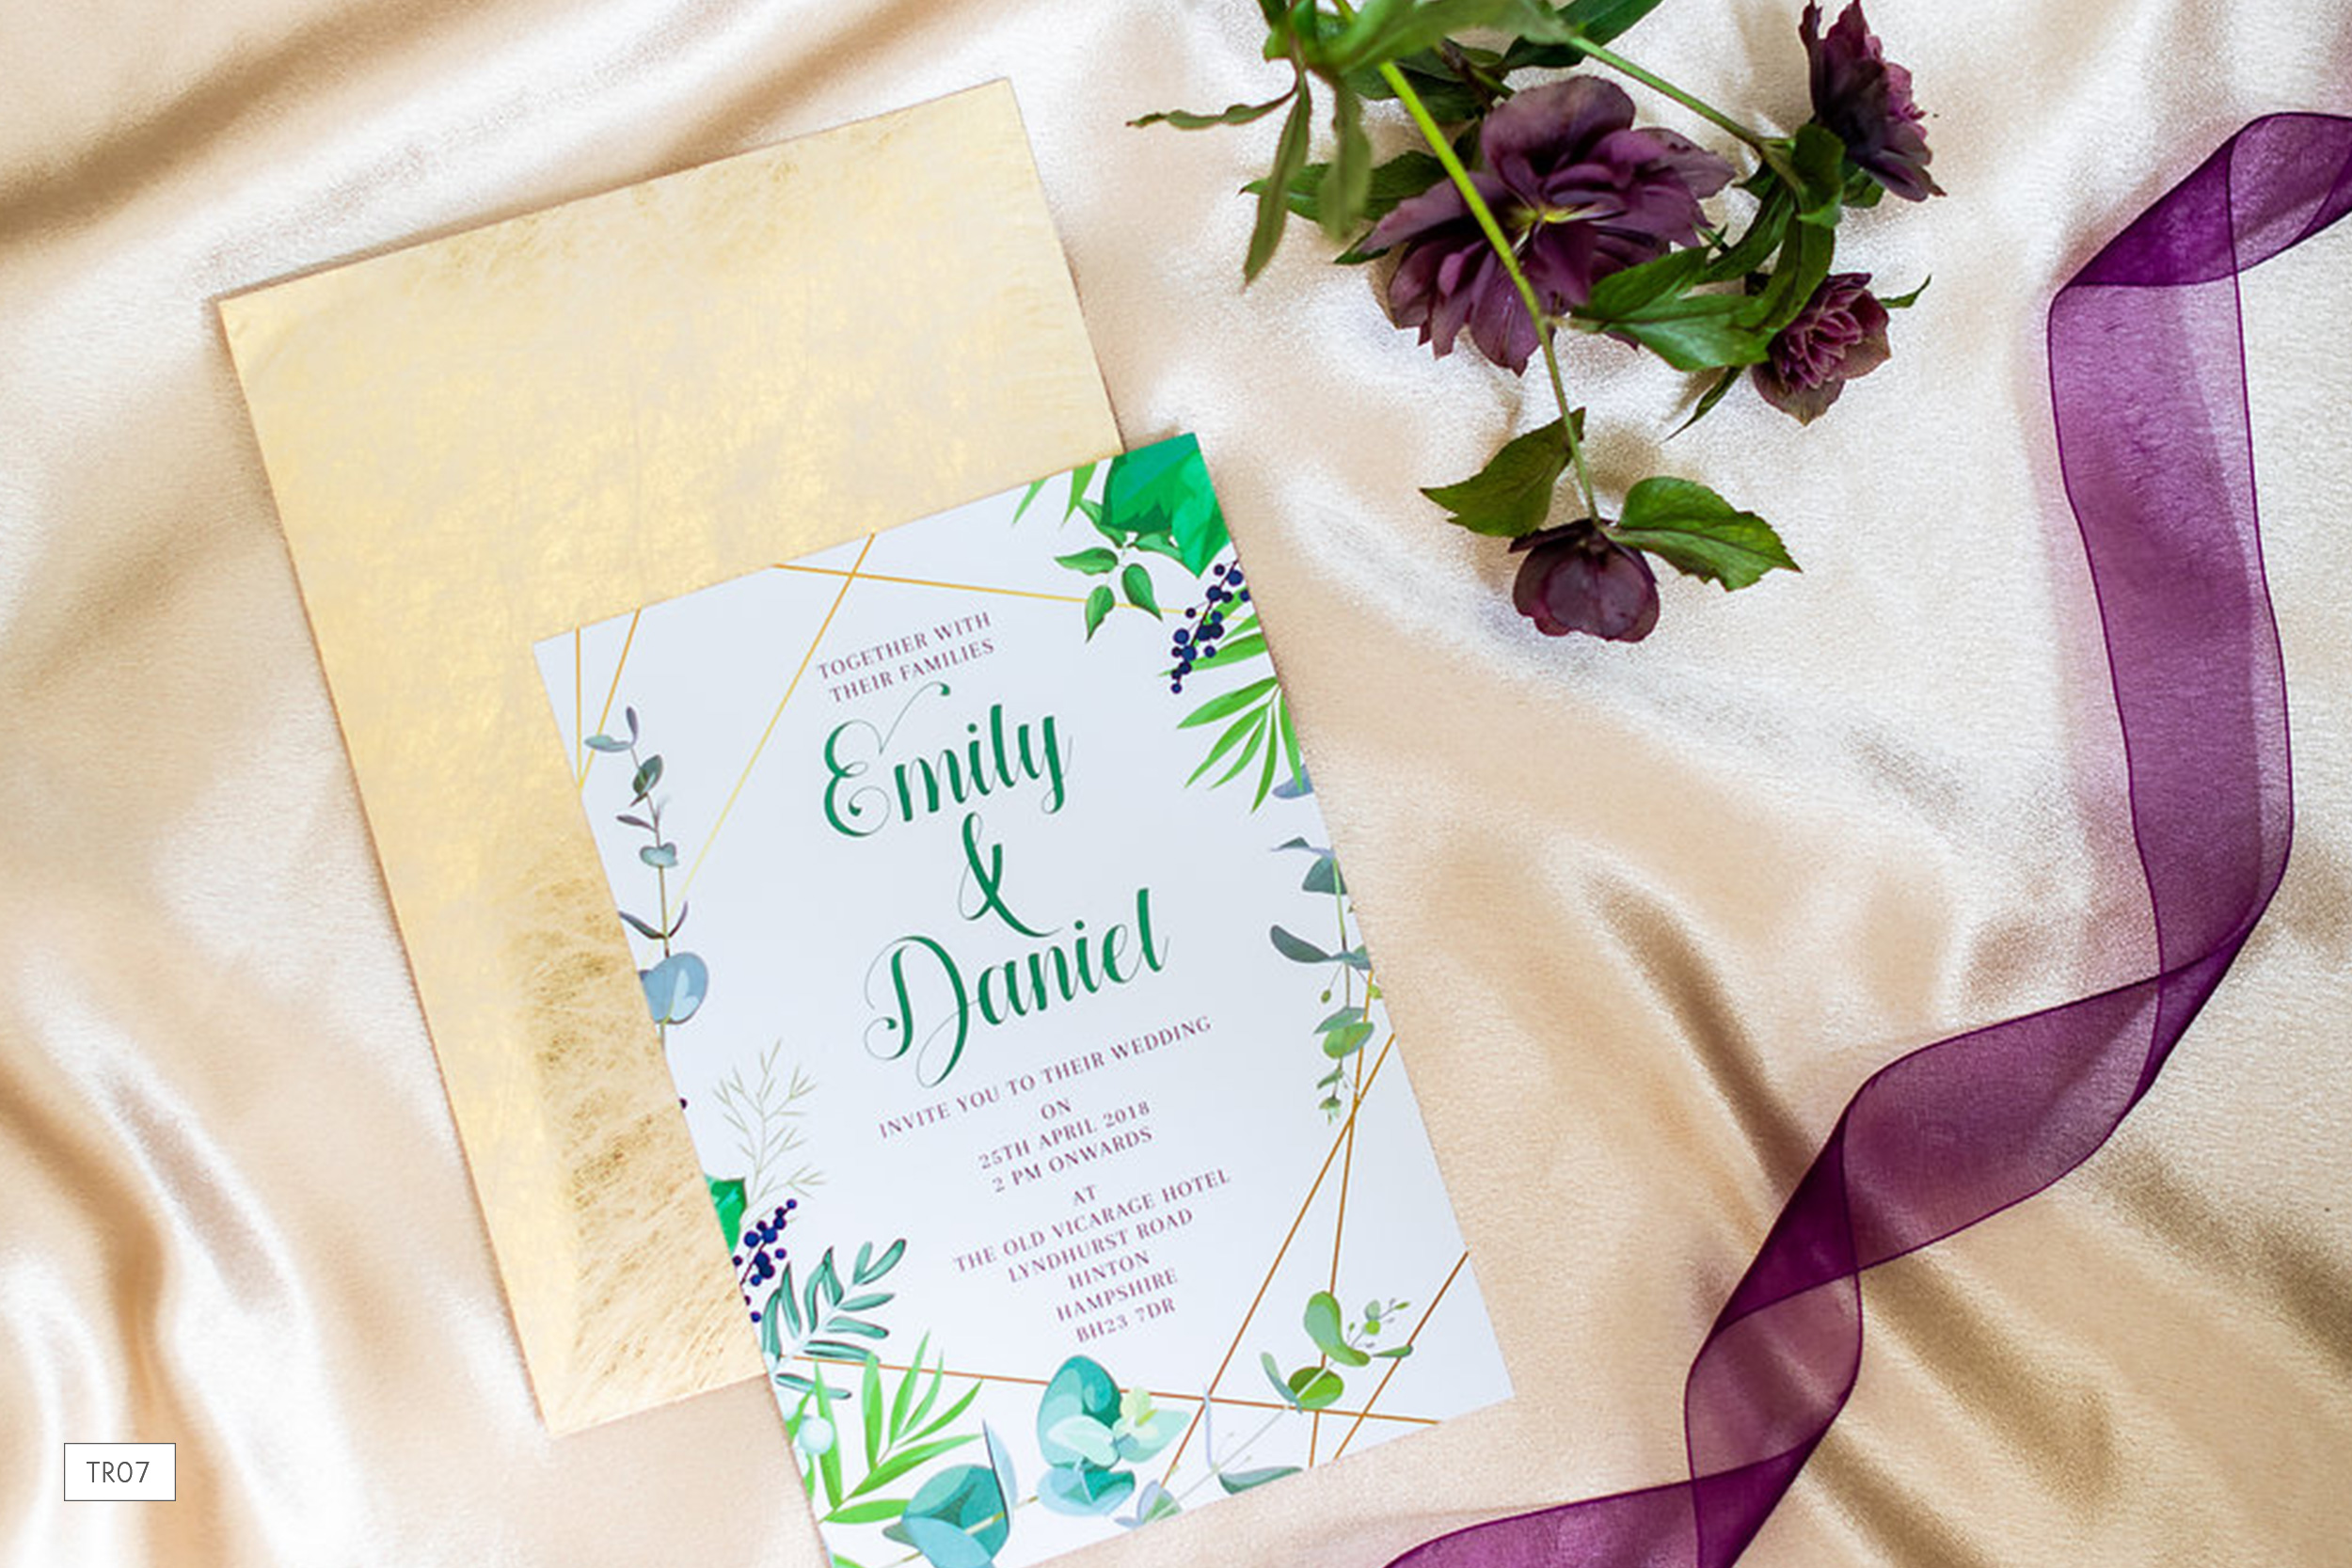 tr07-tropical-wedding-invitation.jpg